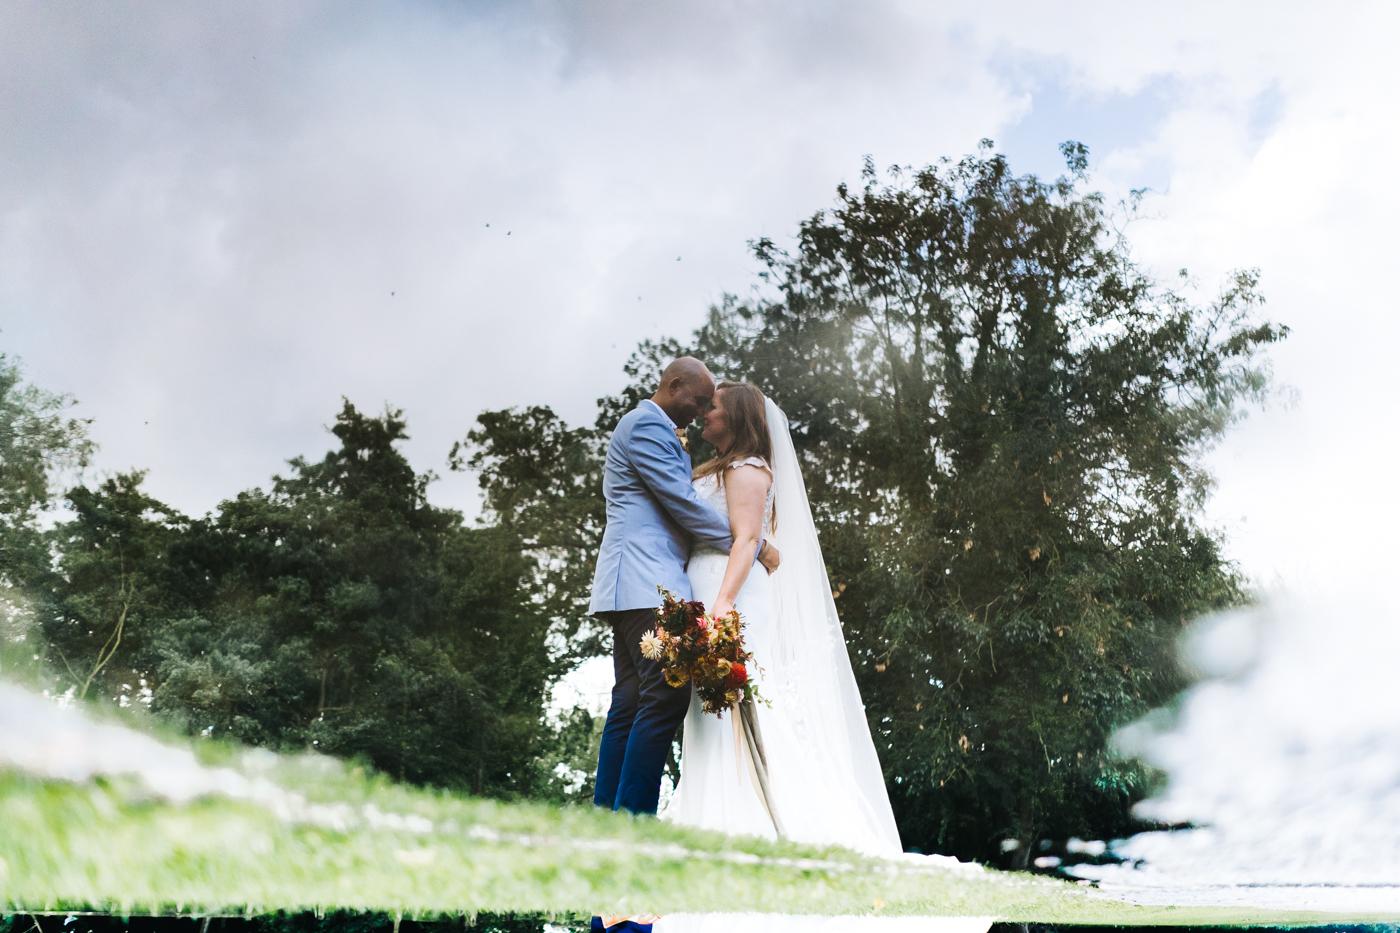 wedding-at-the-pheasant-harome-helmsley-north-yorkshire-wedding-photographer-0030.jpg